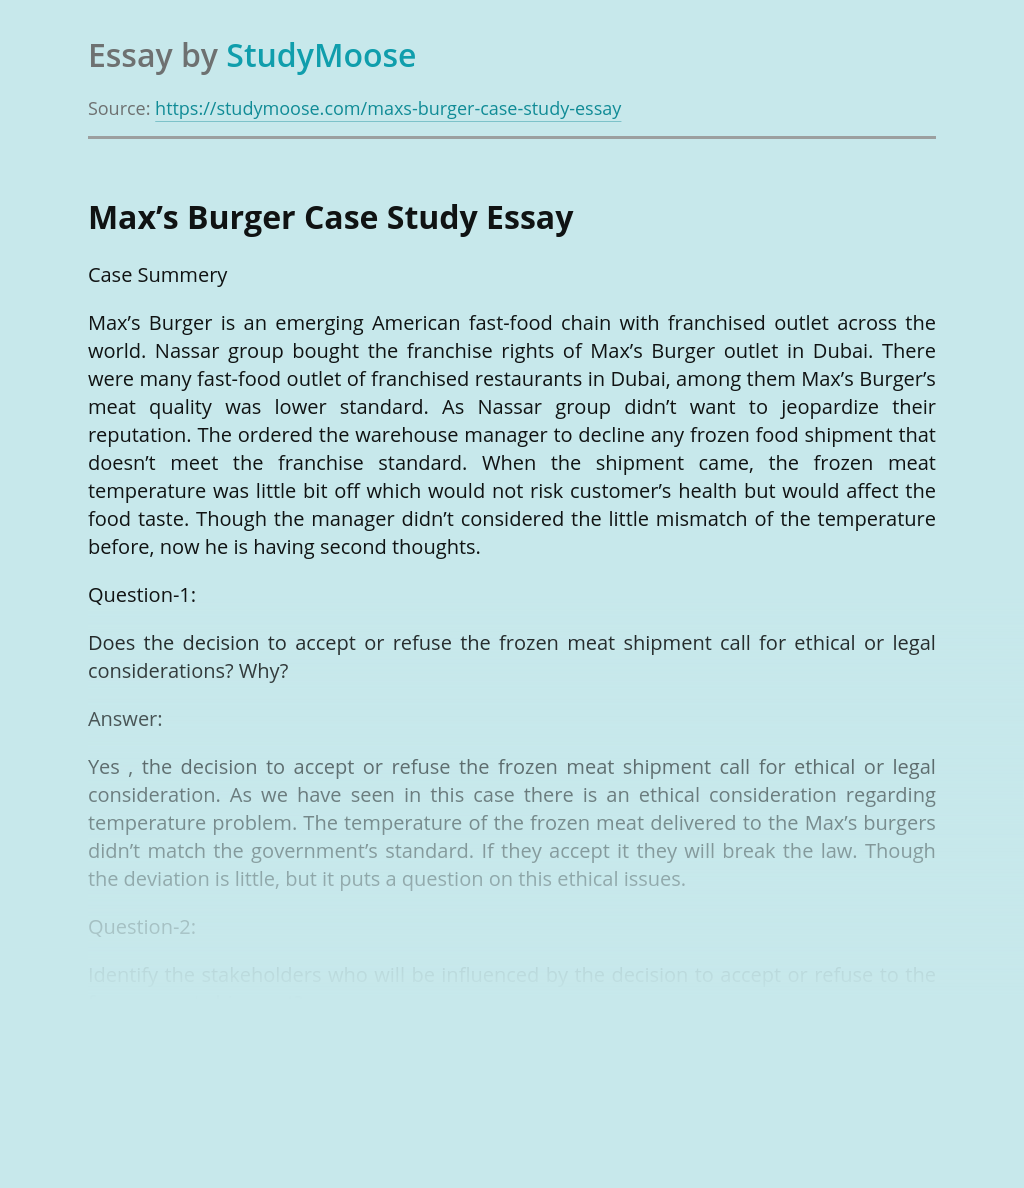 Max's Burger Case Study